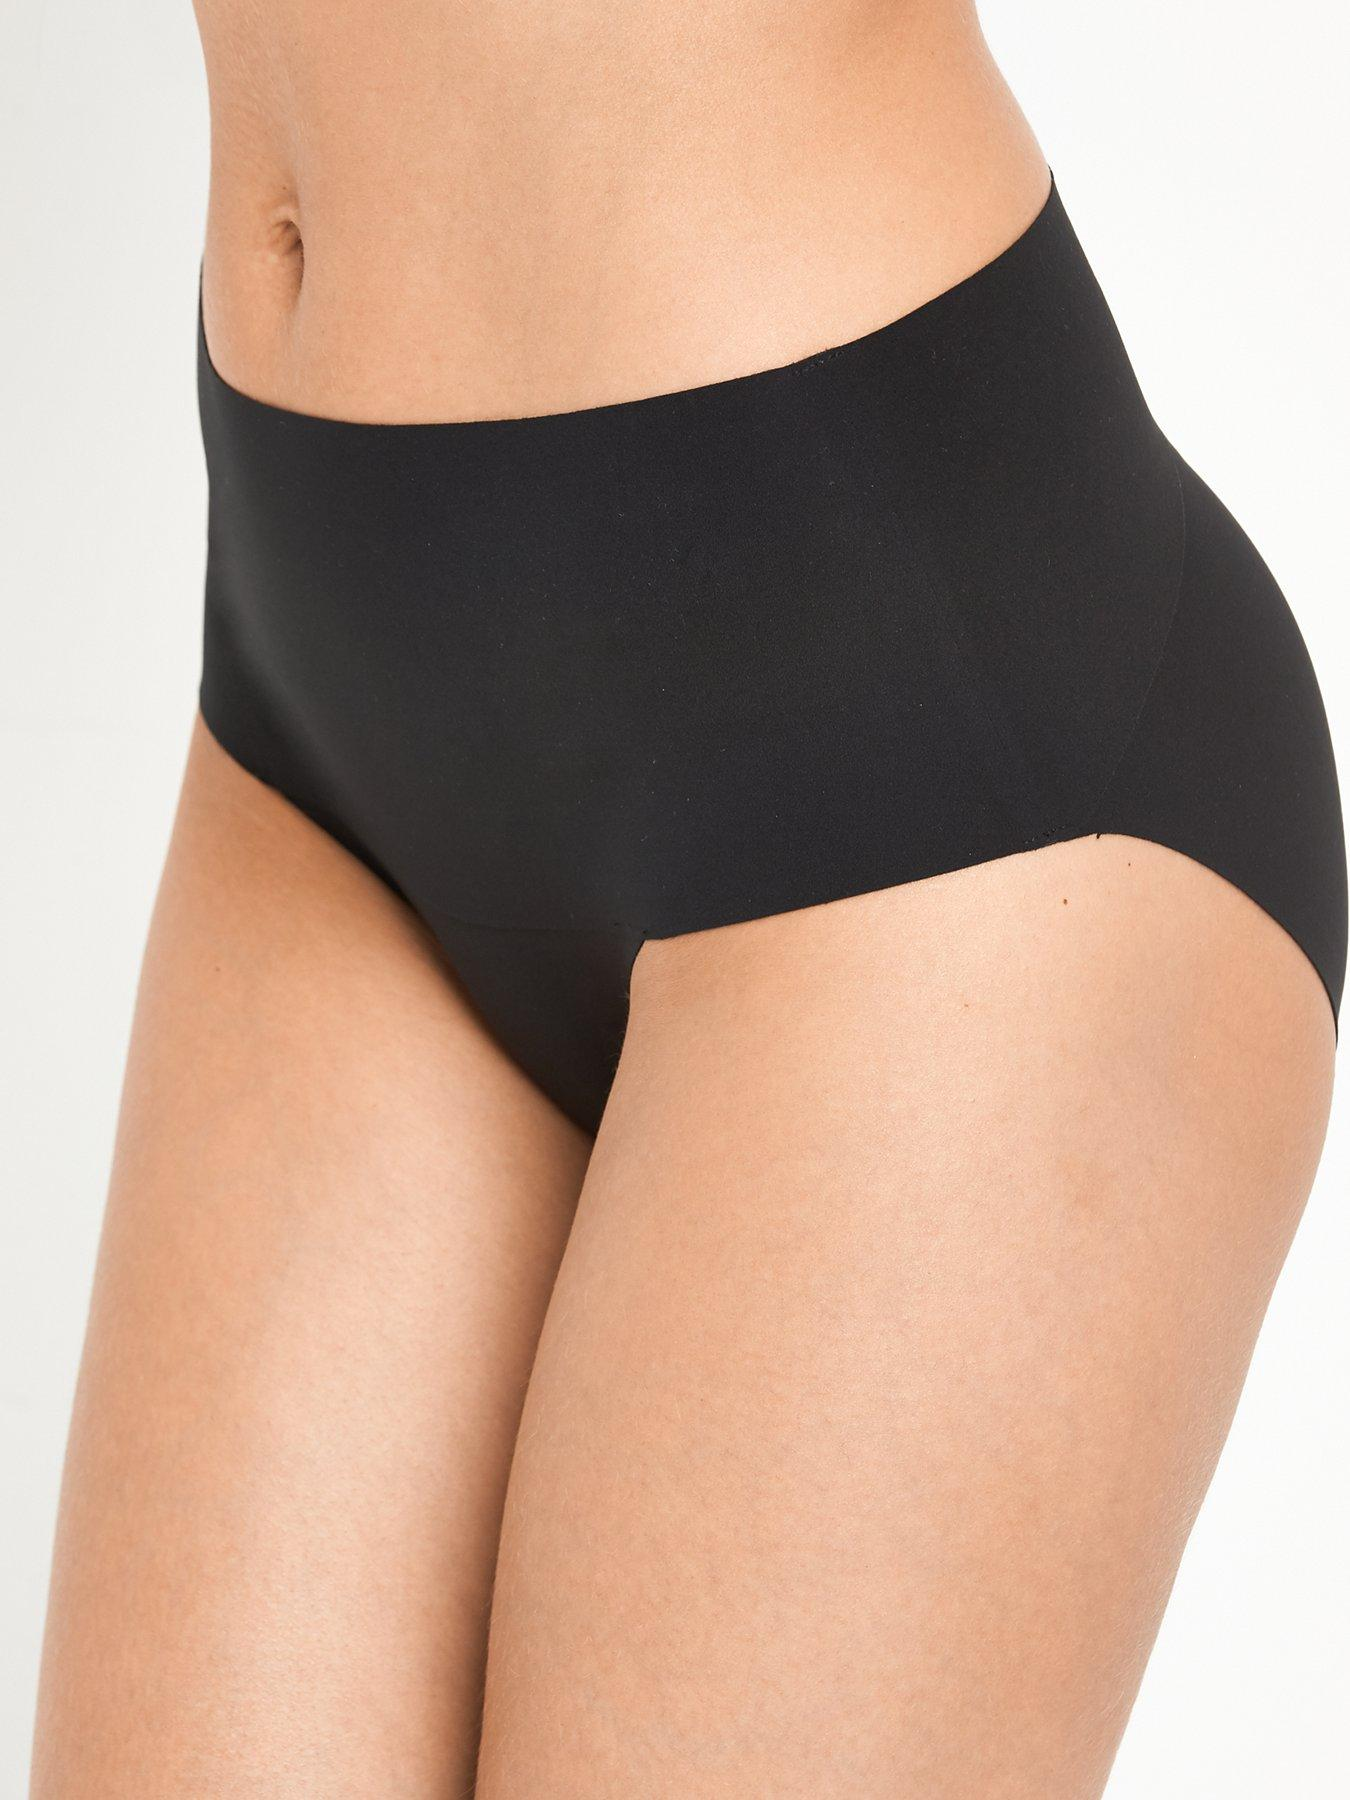 Size 16. Ladies Famous Make Fawn Stripe Firm Control No VPL High Leg Briefs